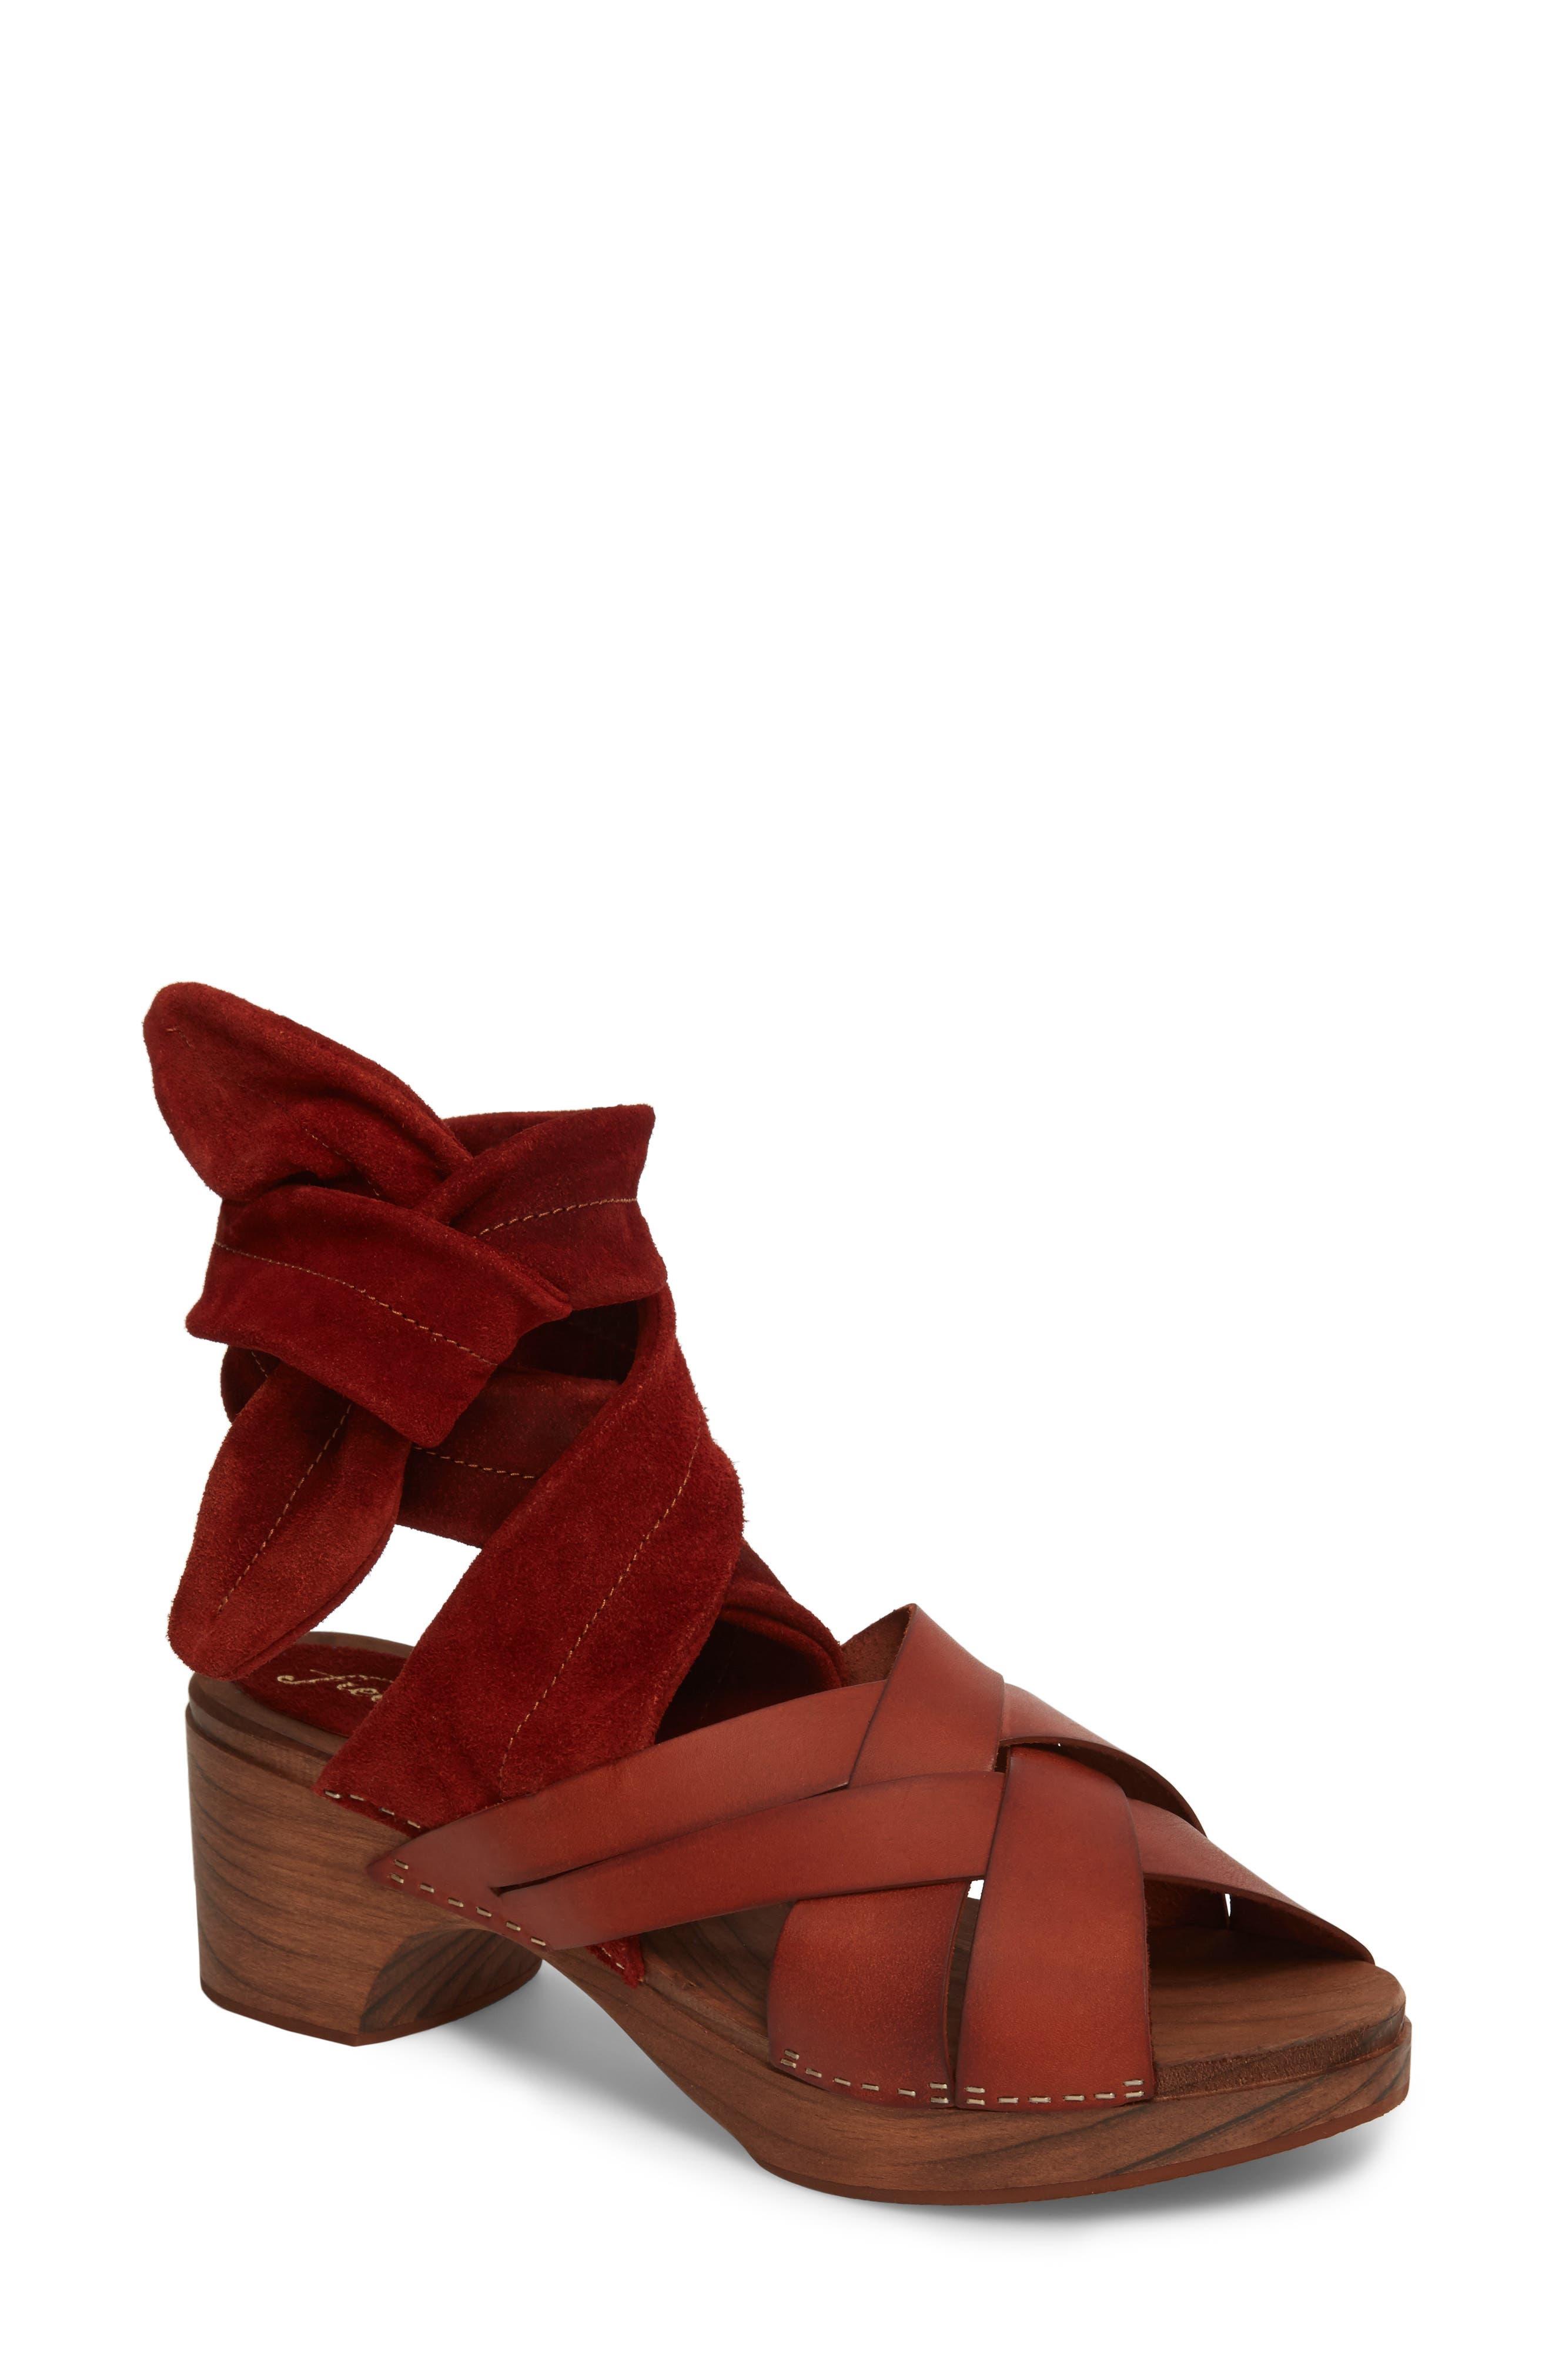 Emmy Ankle Wrap Sandal,                             Main thumbnail 1, color,                             Brown